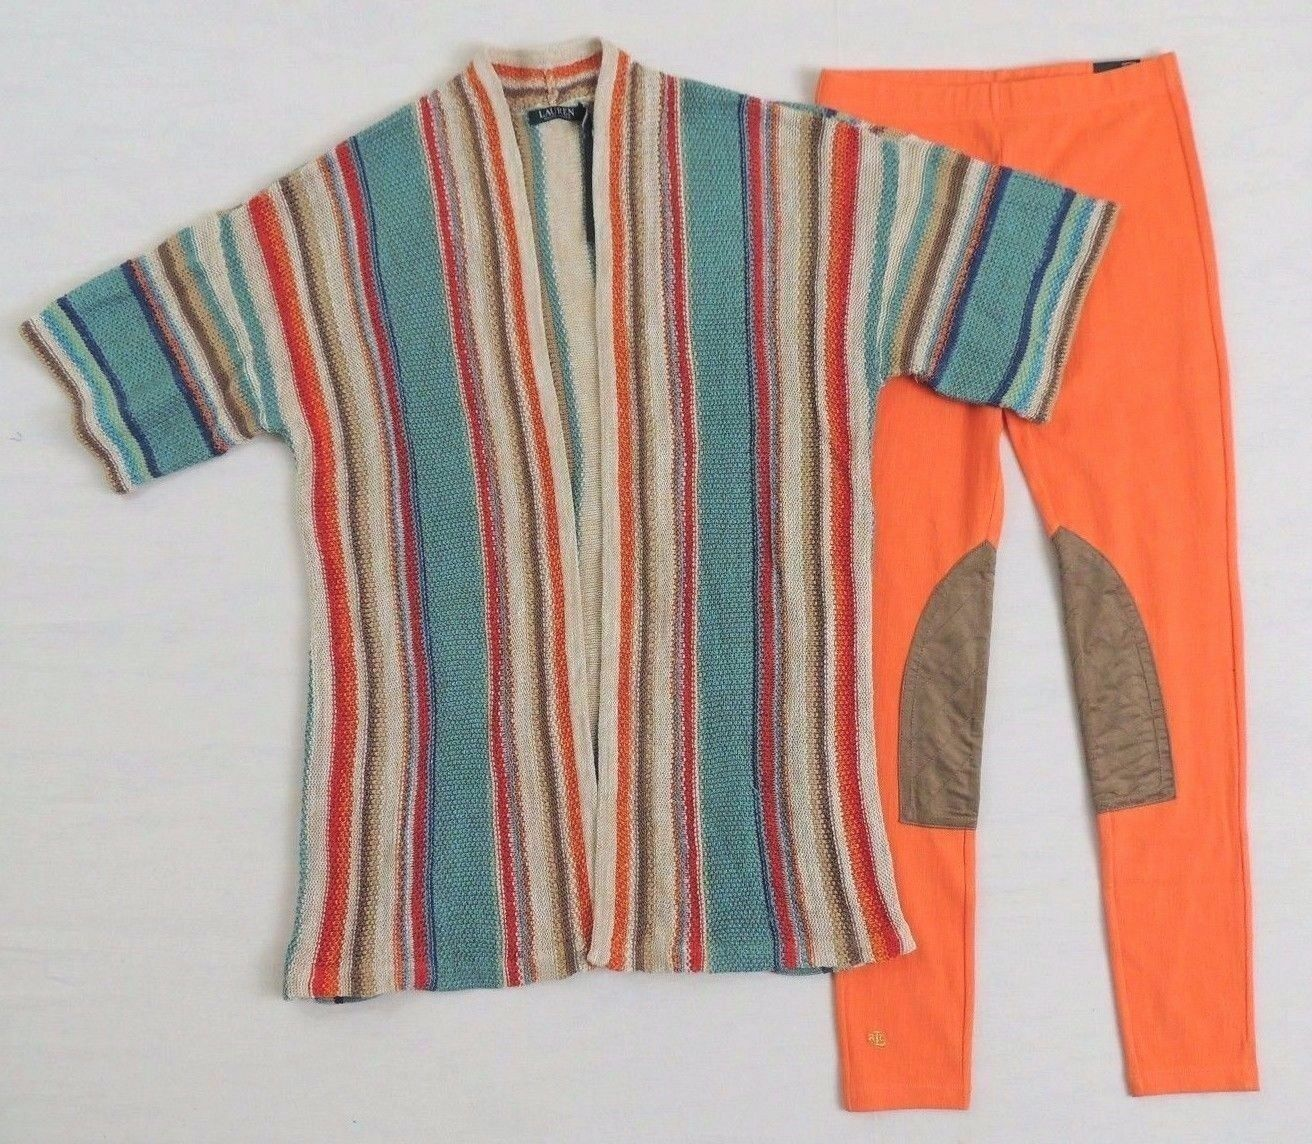 Ralph Lauren Indian Serape Navajo Linen Striped Sweater Cardigan Coat Petit